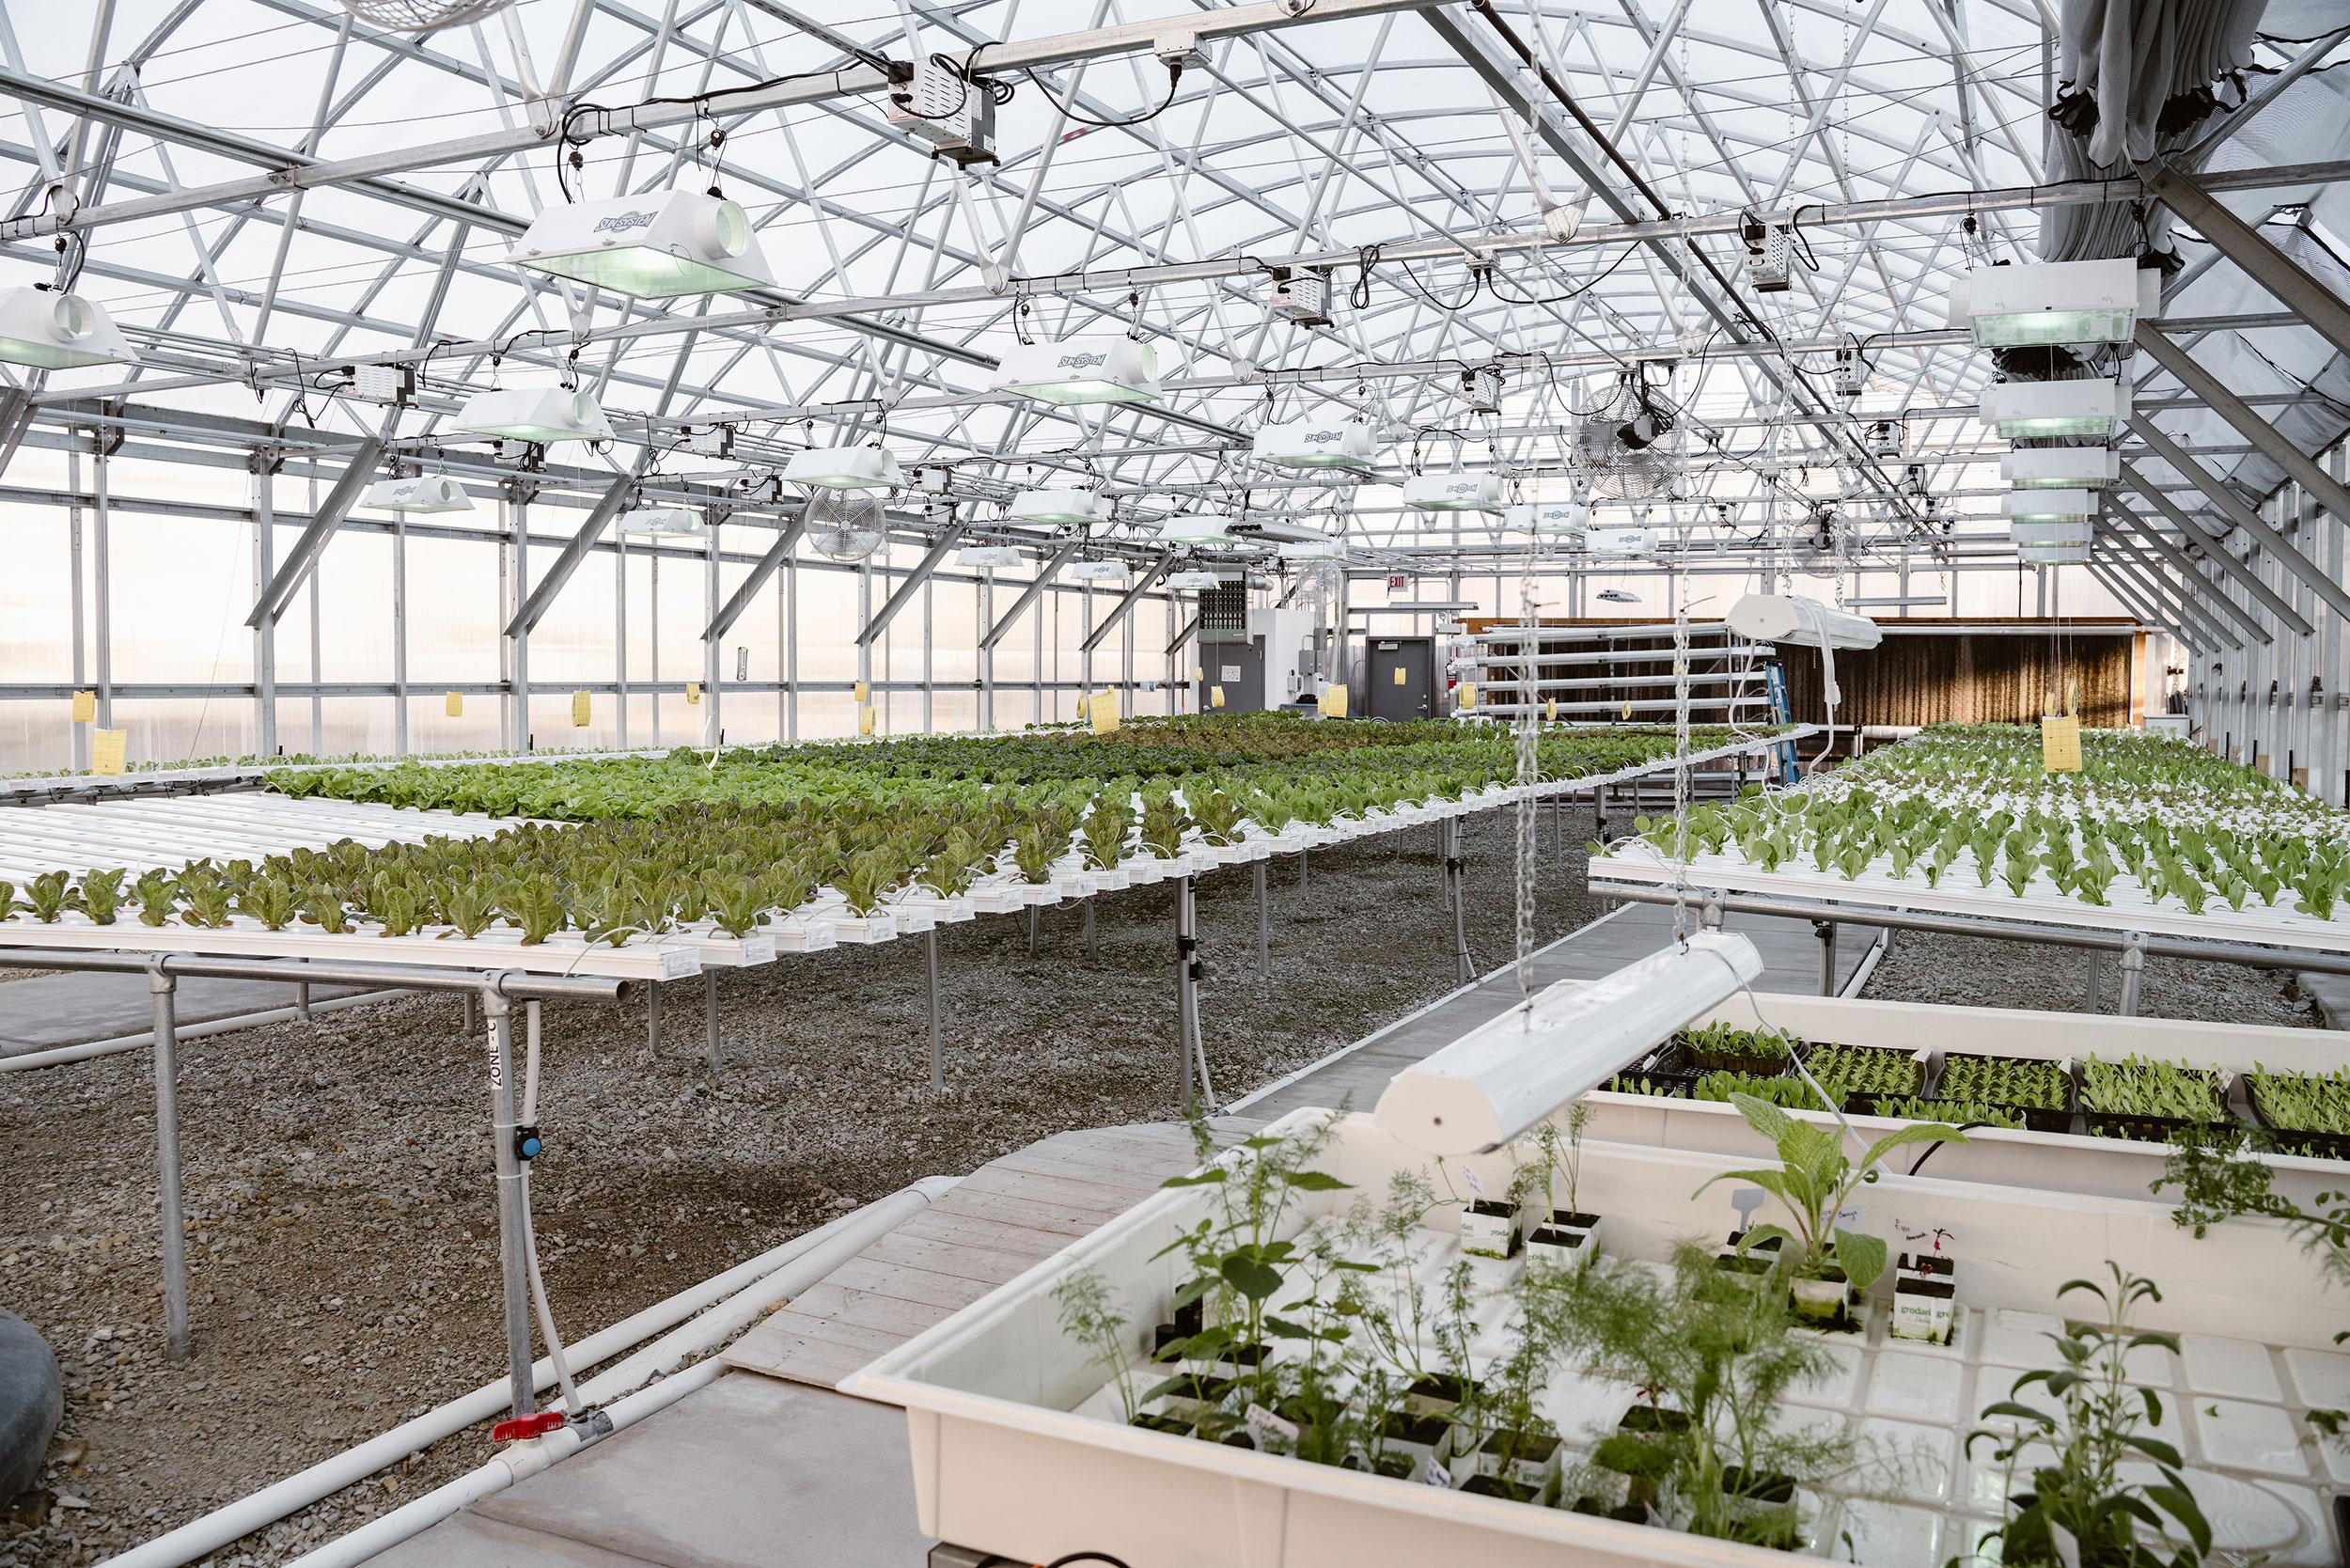 Herban-Produce-_-3-19-19-(5-of-55).jpg